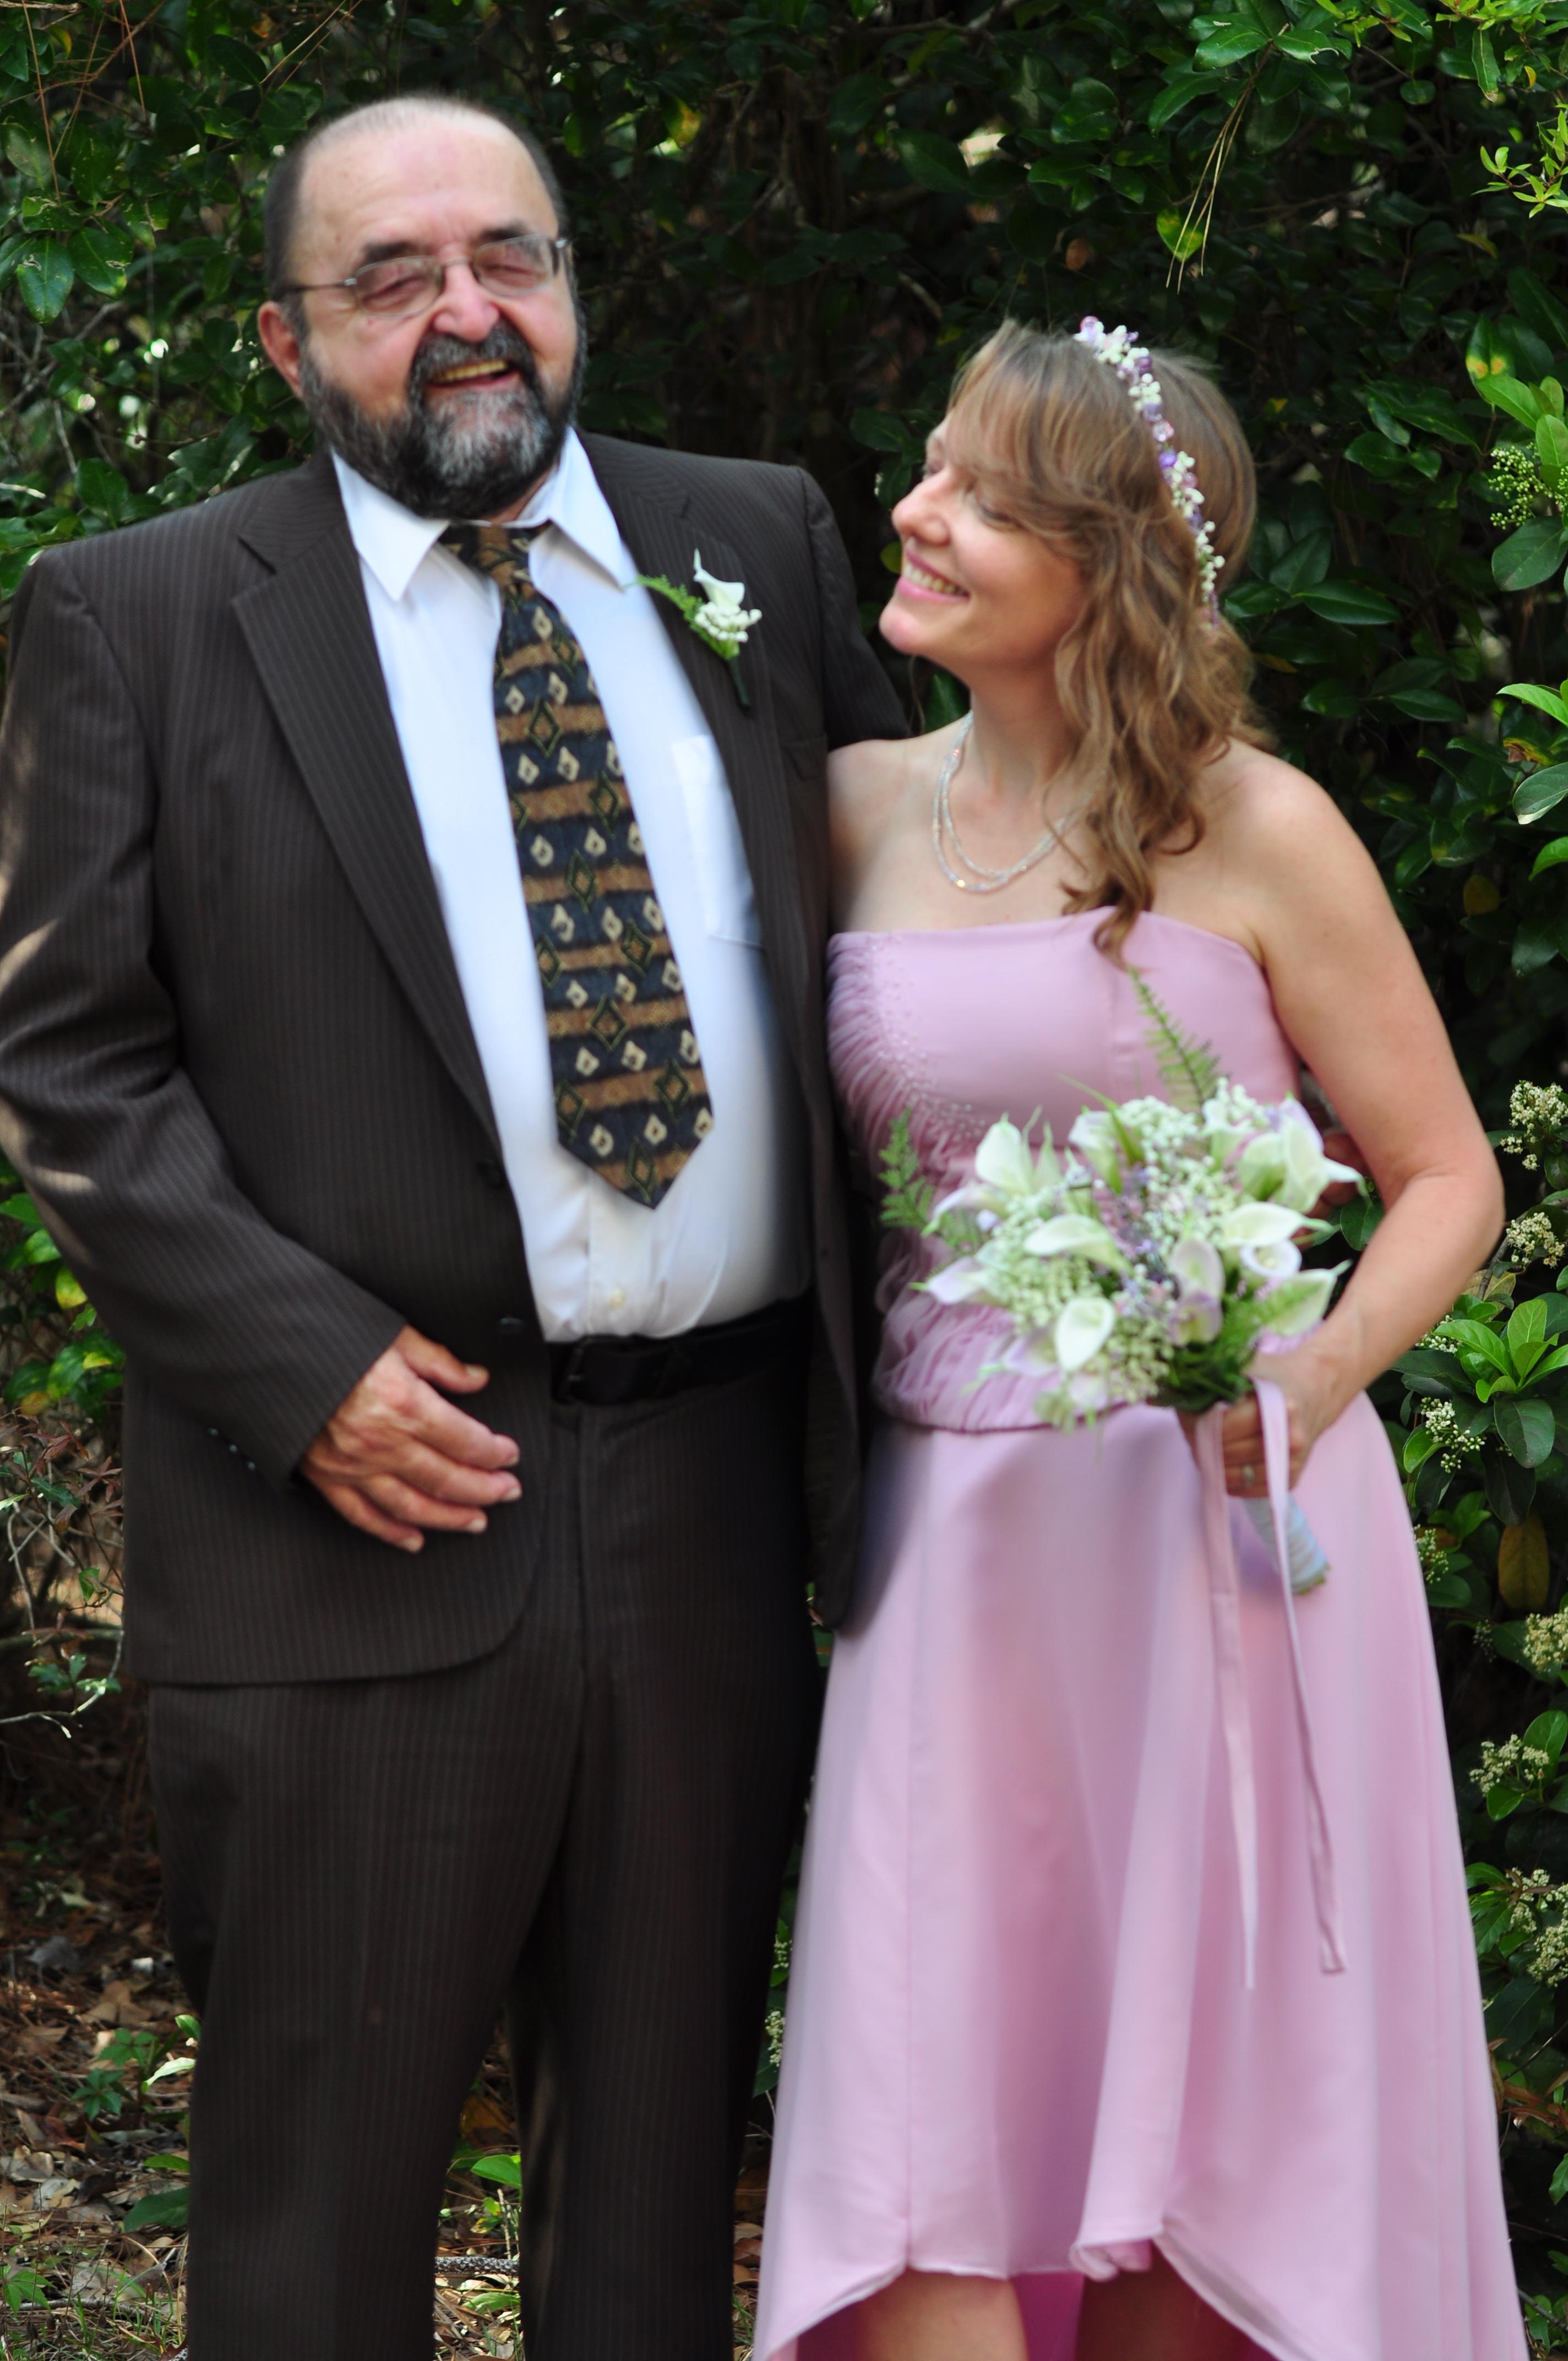 emily-and-travis-4-1-2013-april-fools-wedding-345